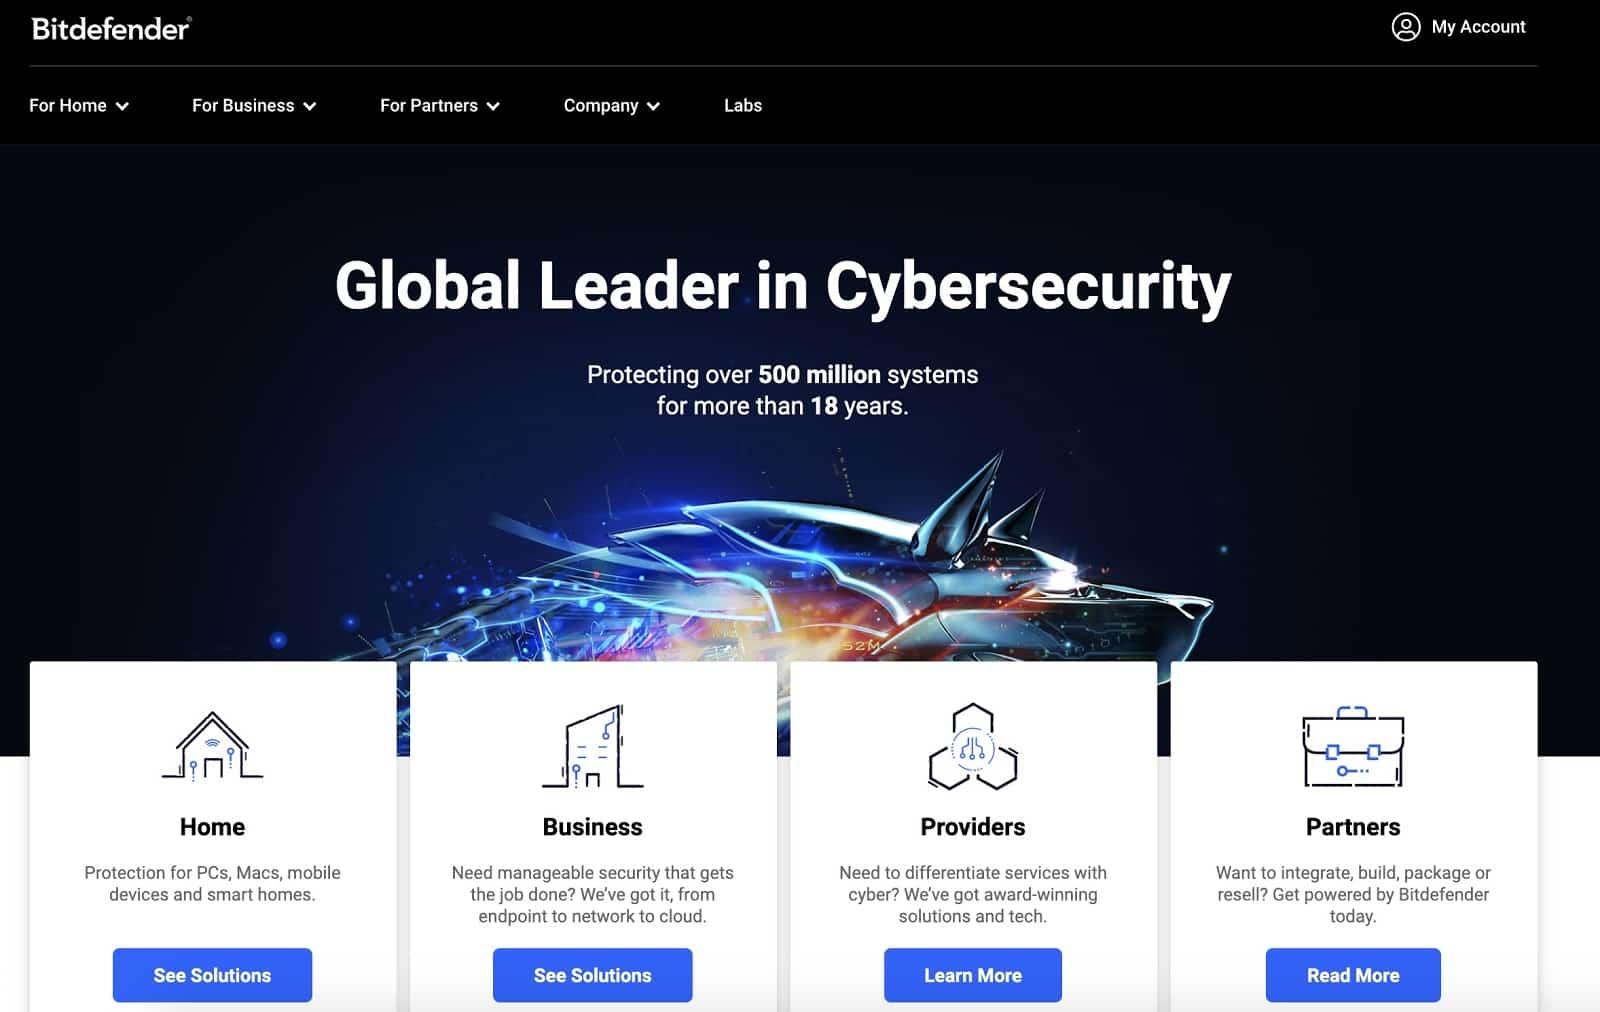 Bitdefender home page